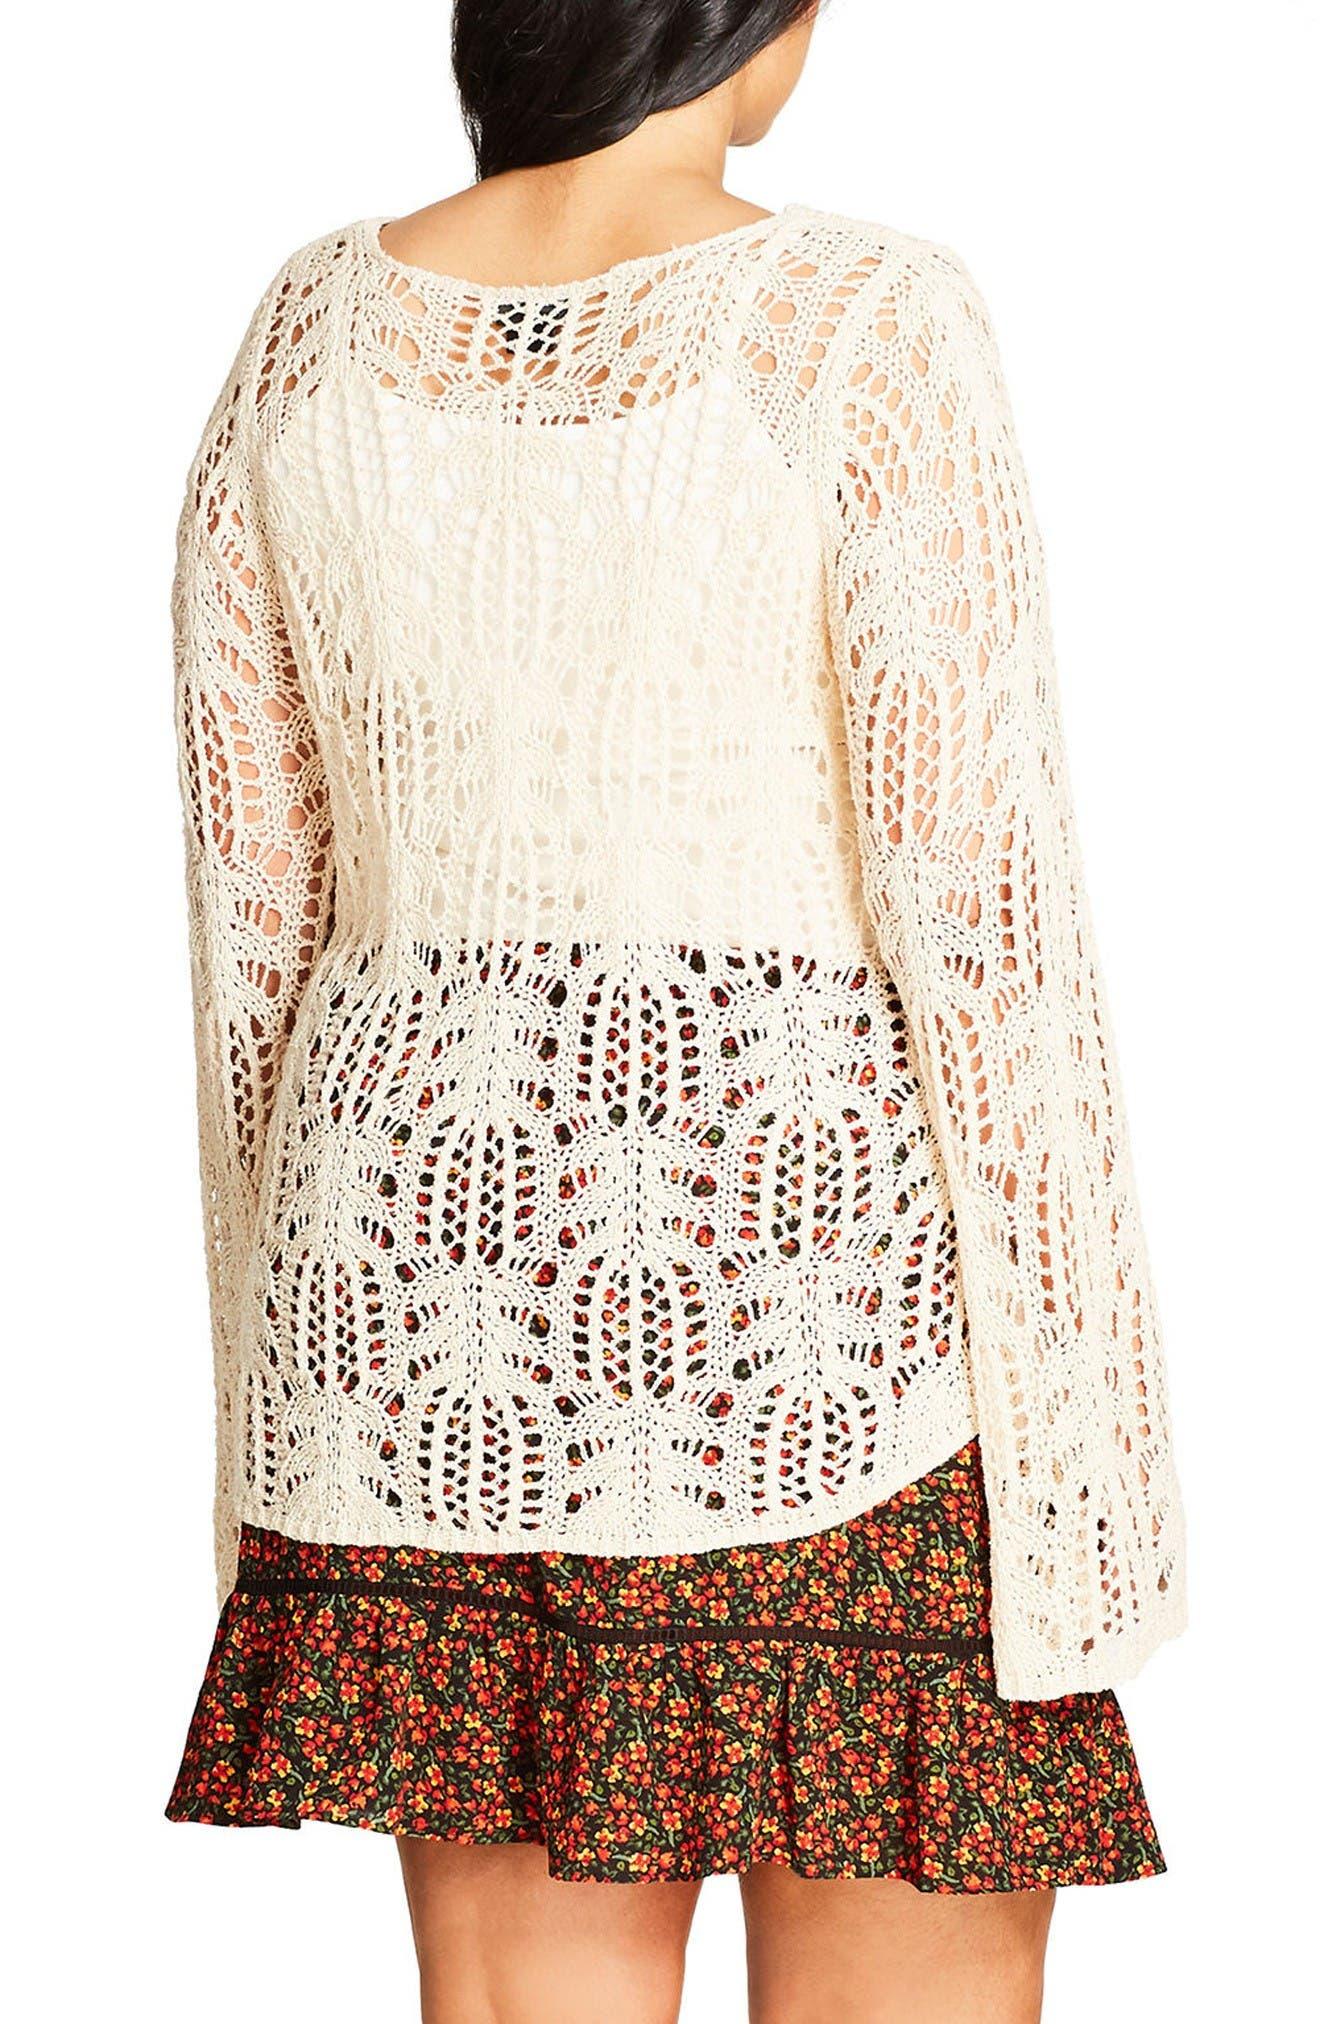 Alternate Image 2  - City Chic So Delicate Crochet Sweater (Plus Size)